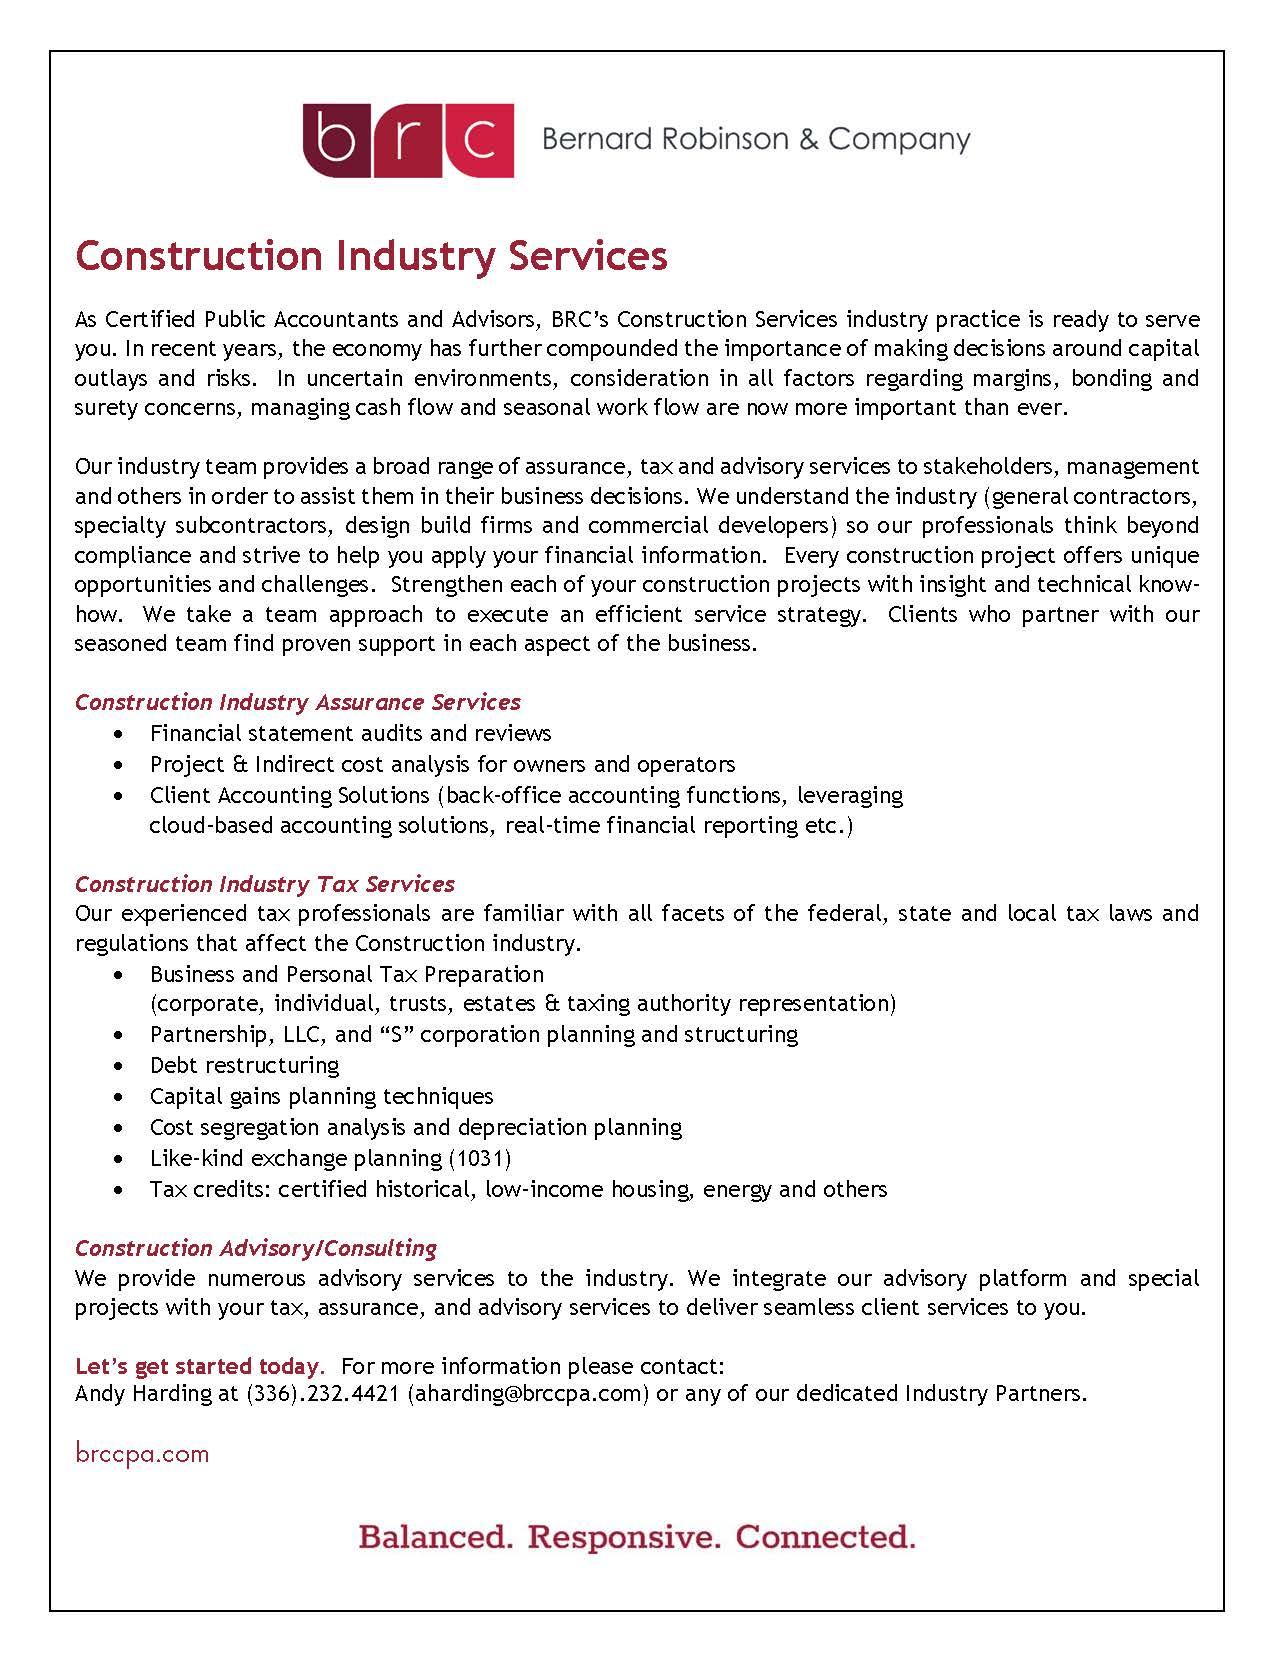 Construction Project Cash Flow Spreadsheet Regarding Construction  Bernard Robinson  Company